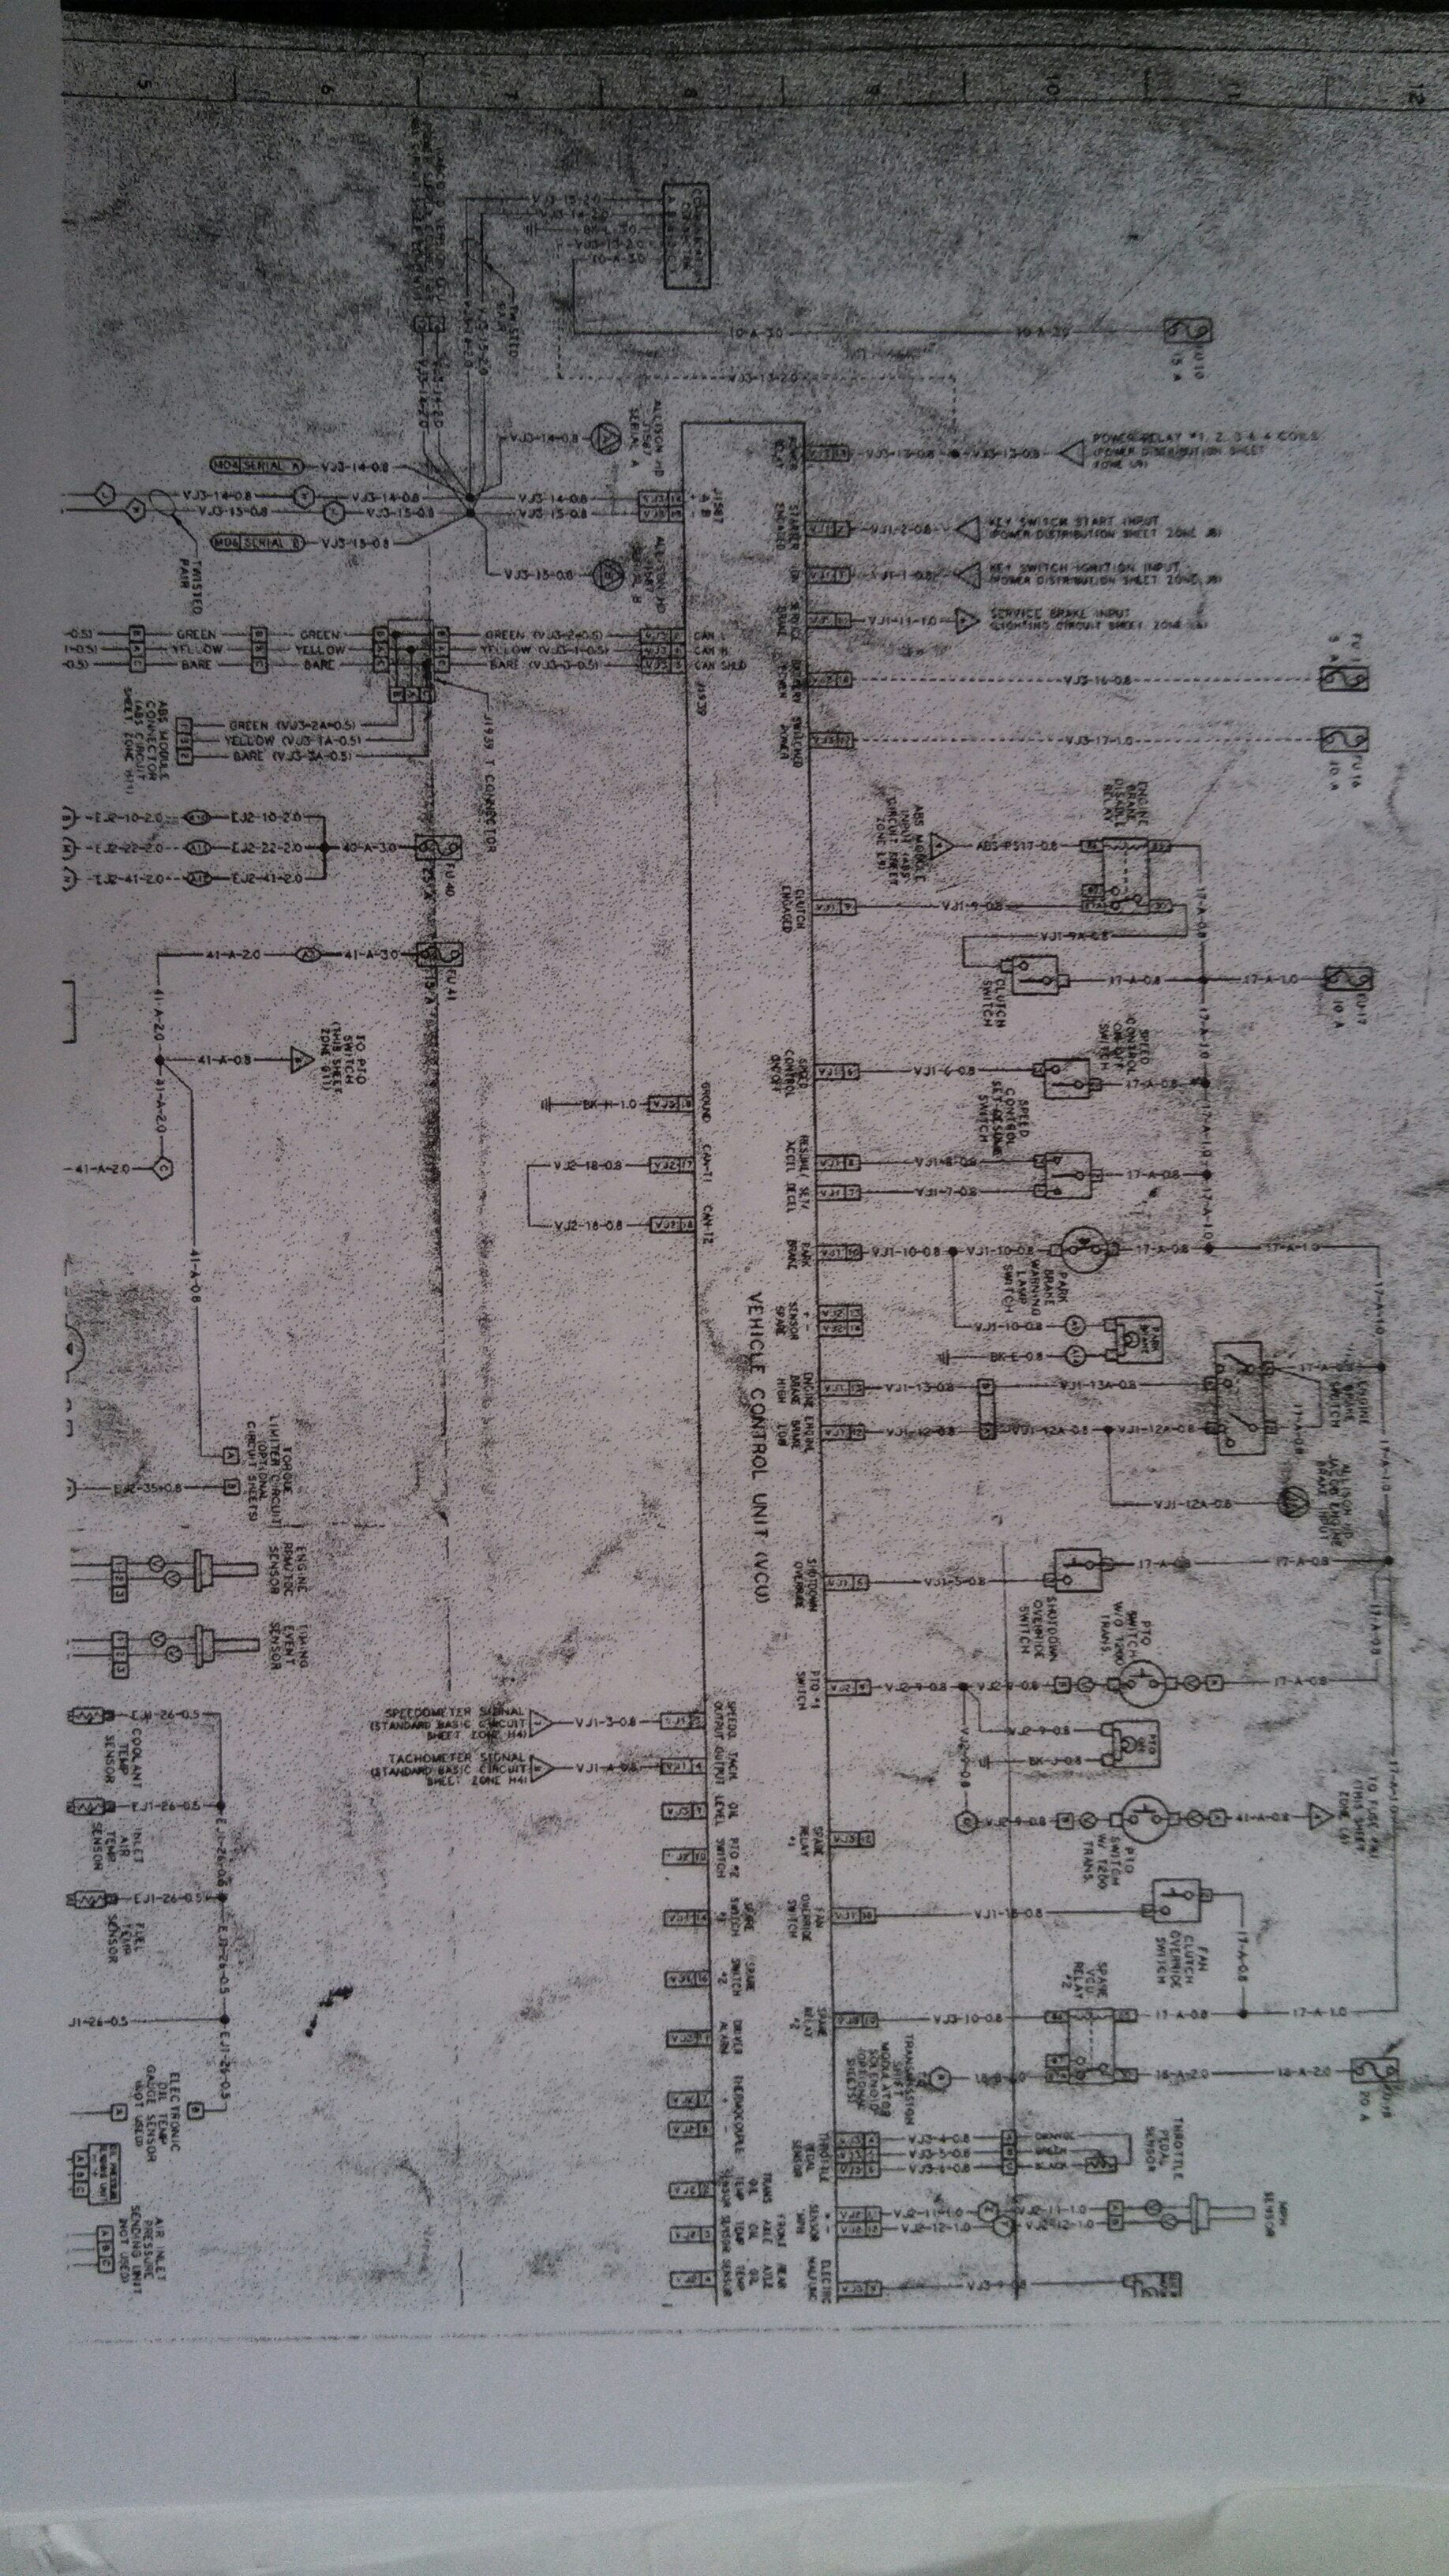 Mack Truck Wiring Diagram Hecho